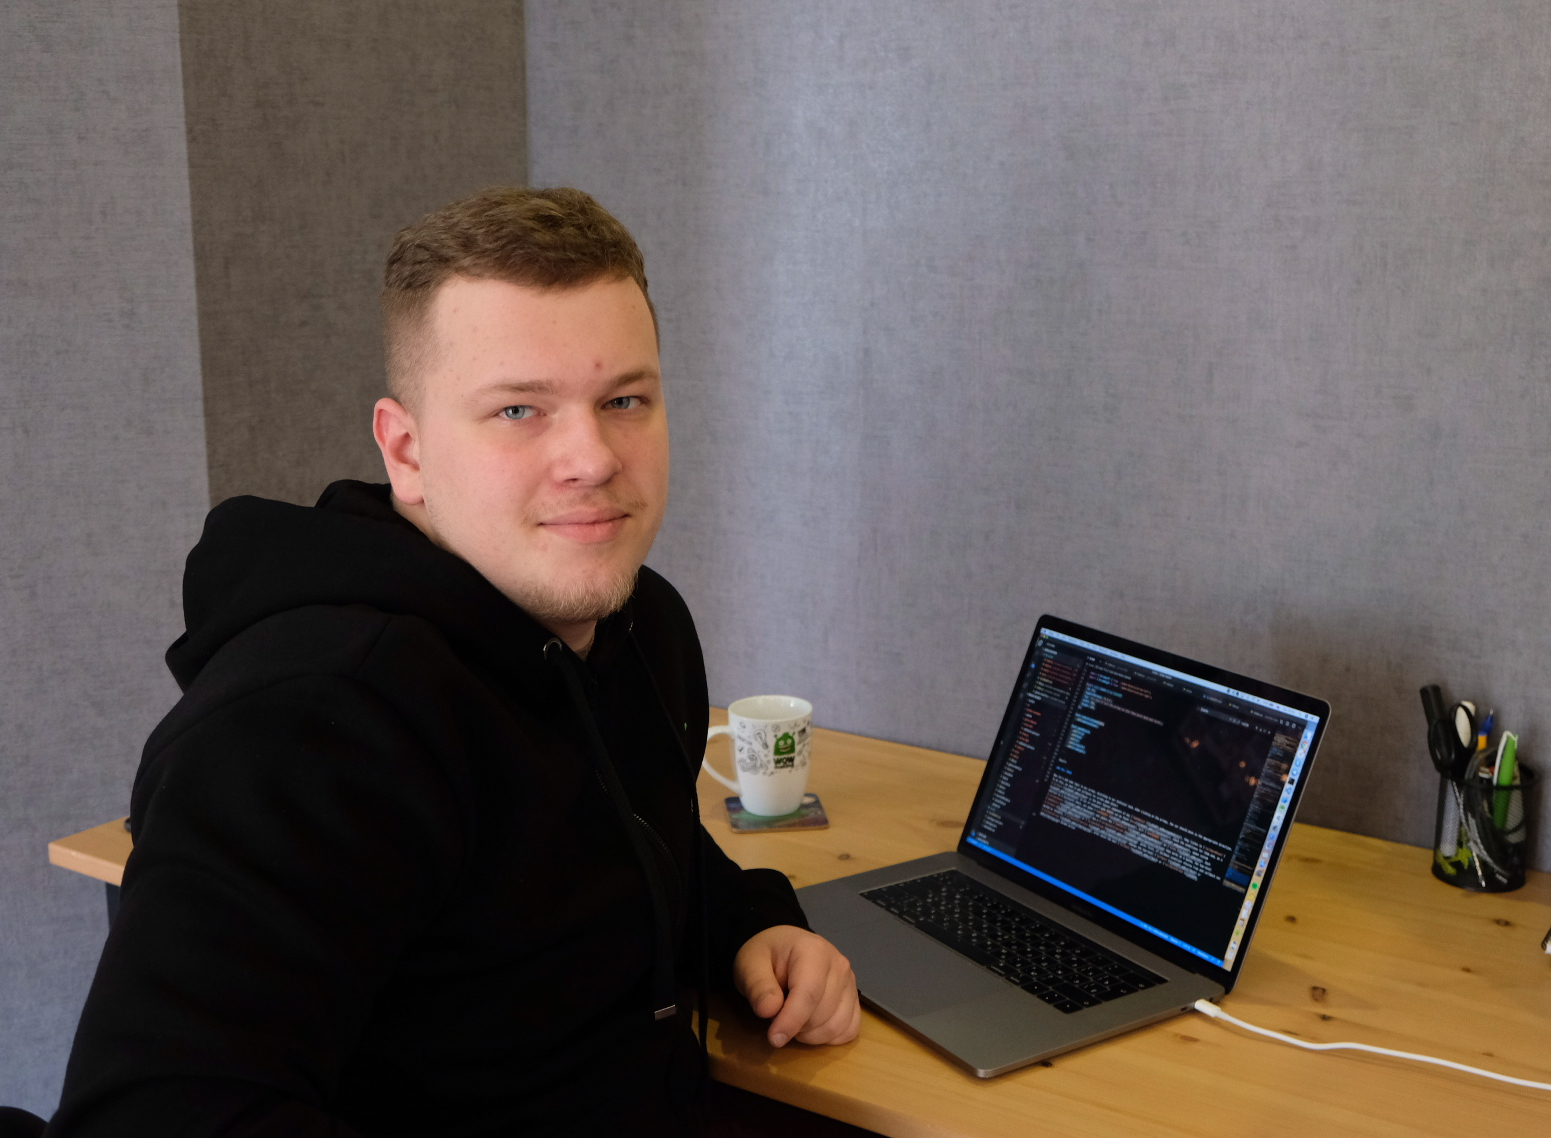 Войти в ИТ: профессия front-end developer